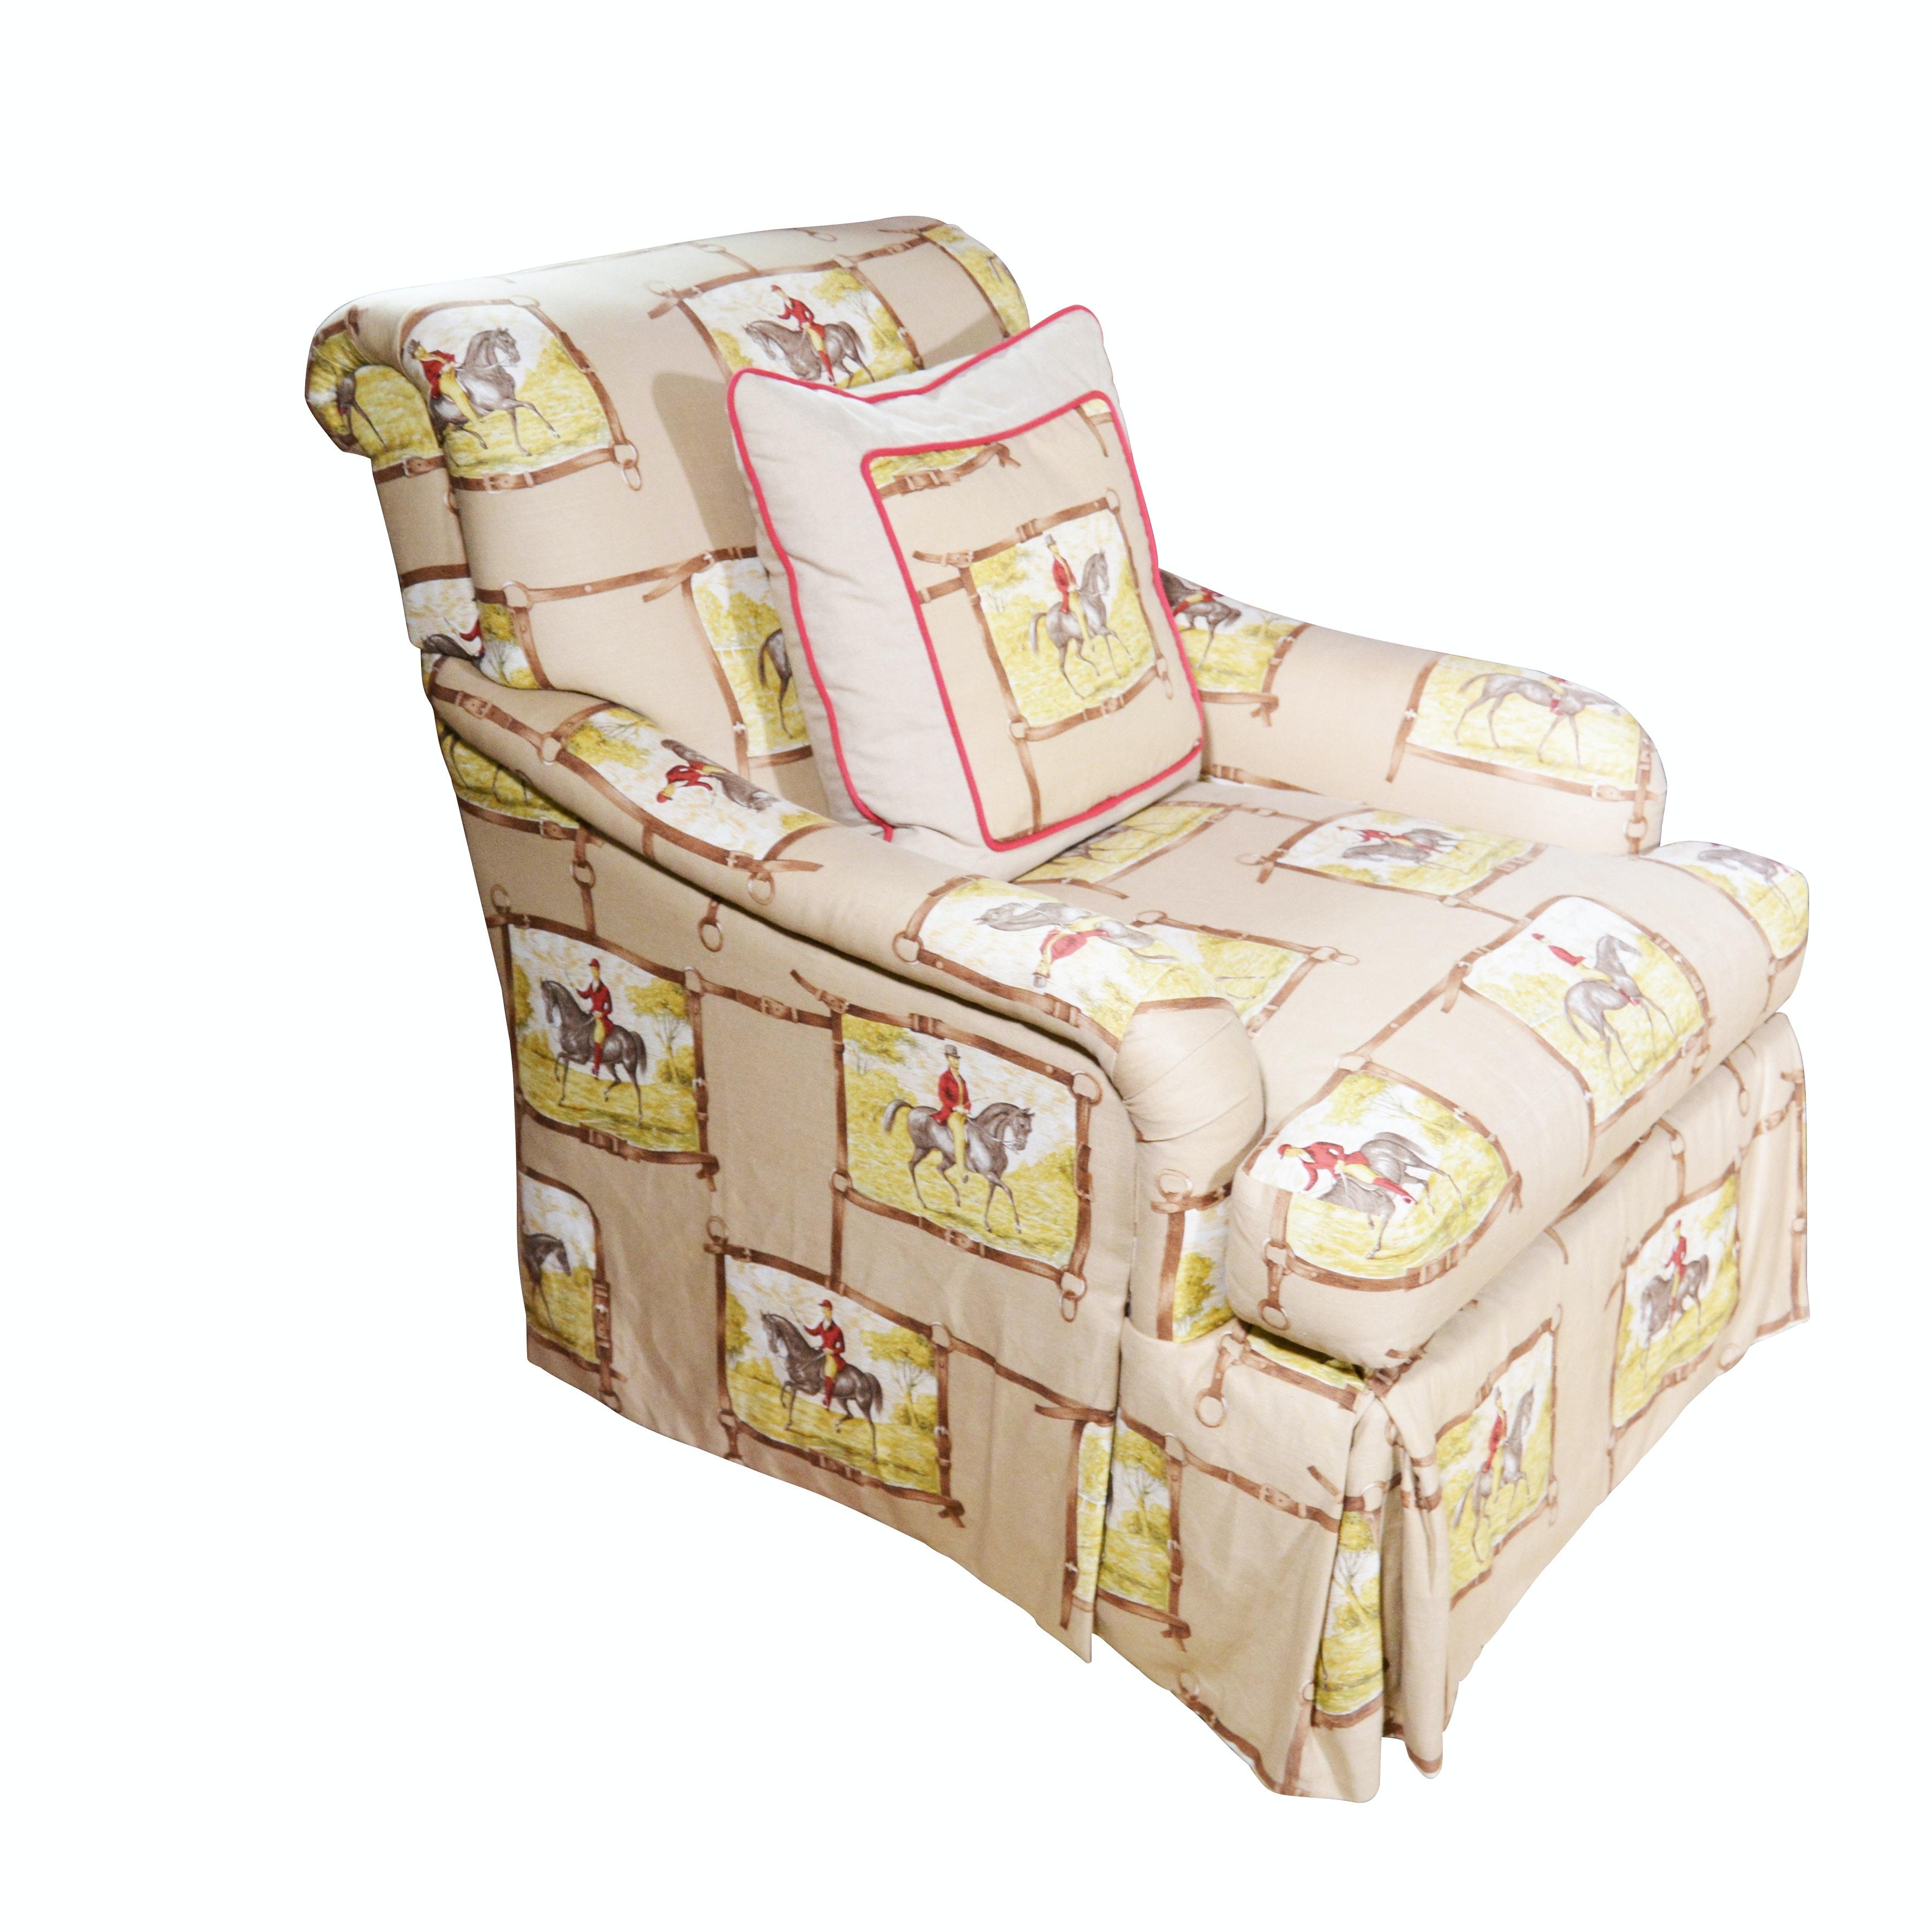 Jockey Upholstered Swivel Lounge Chair, Contemporary